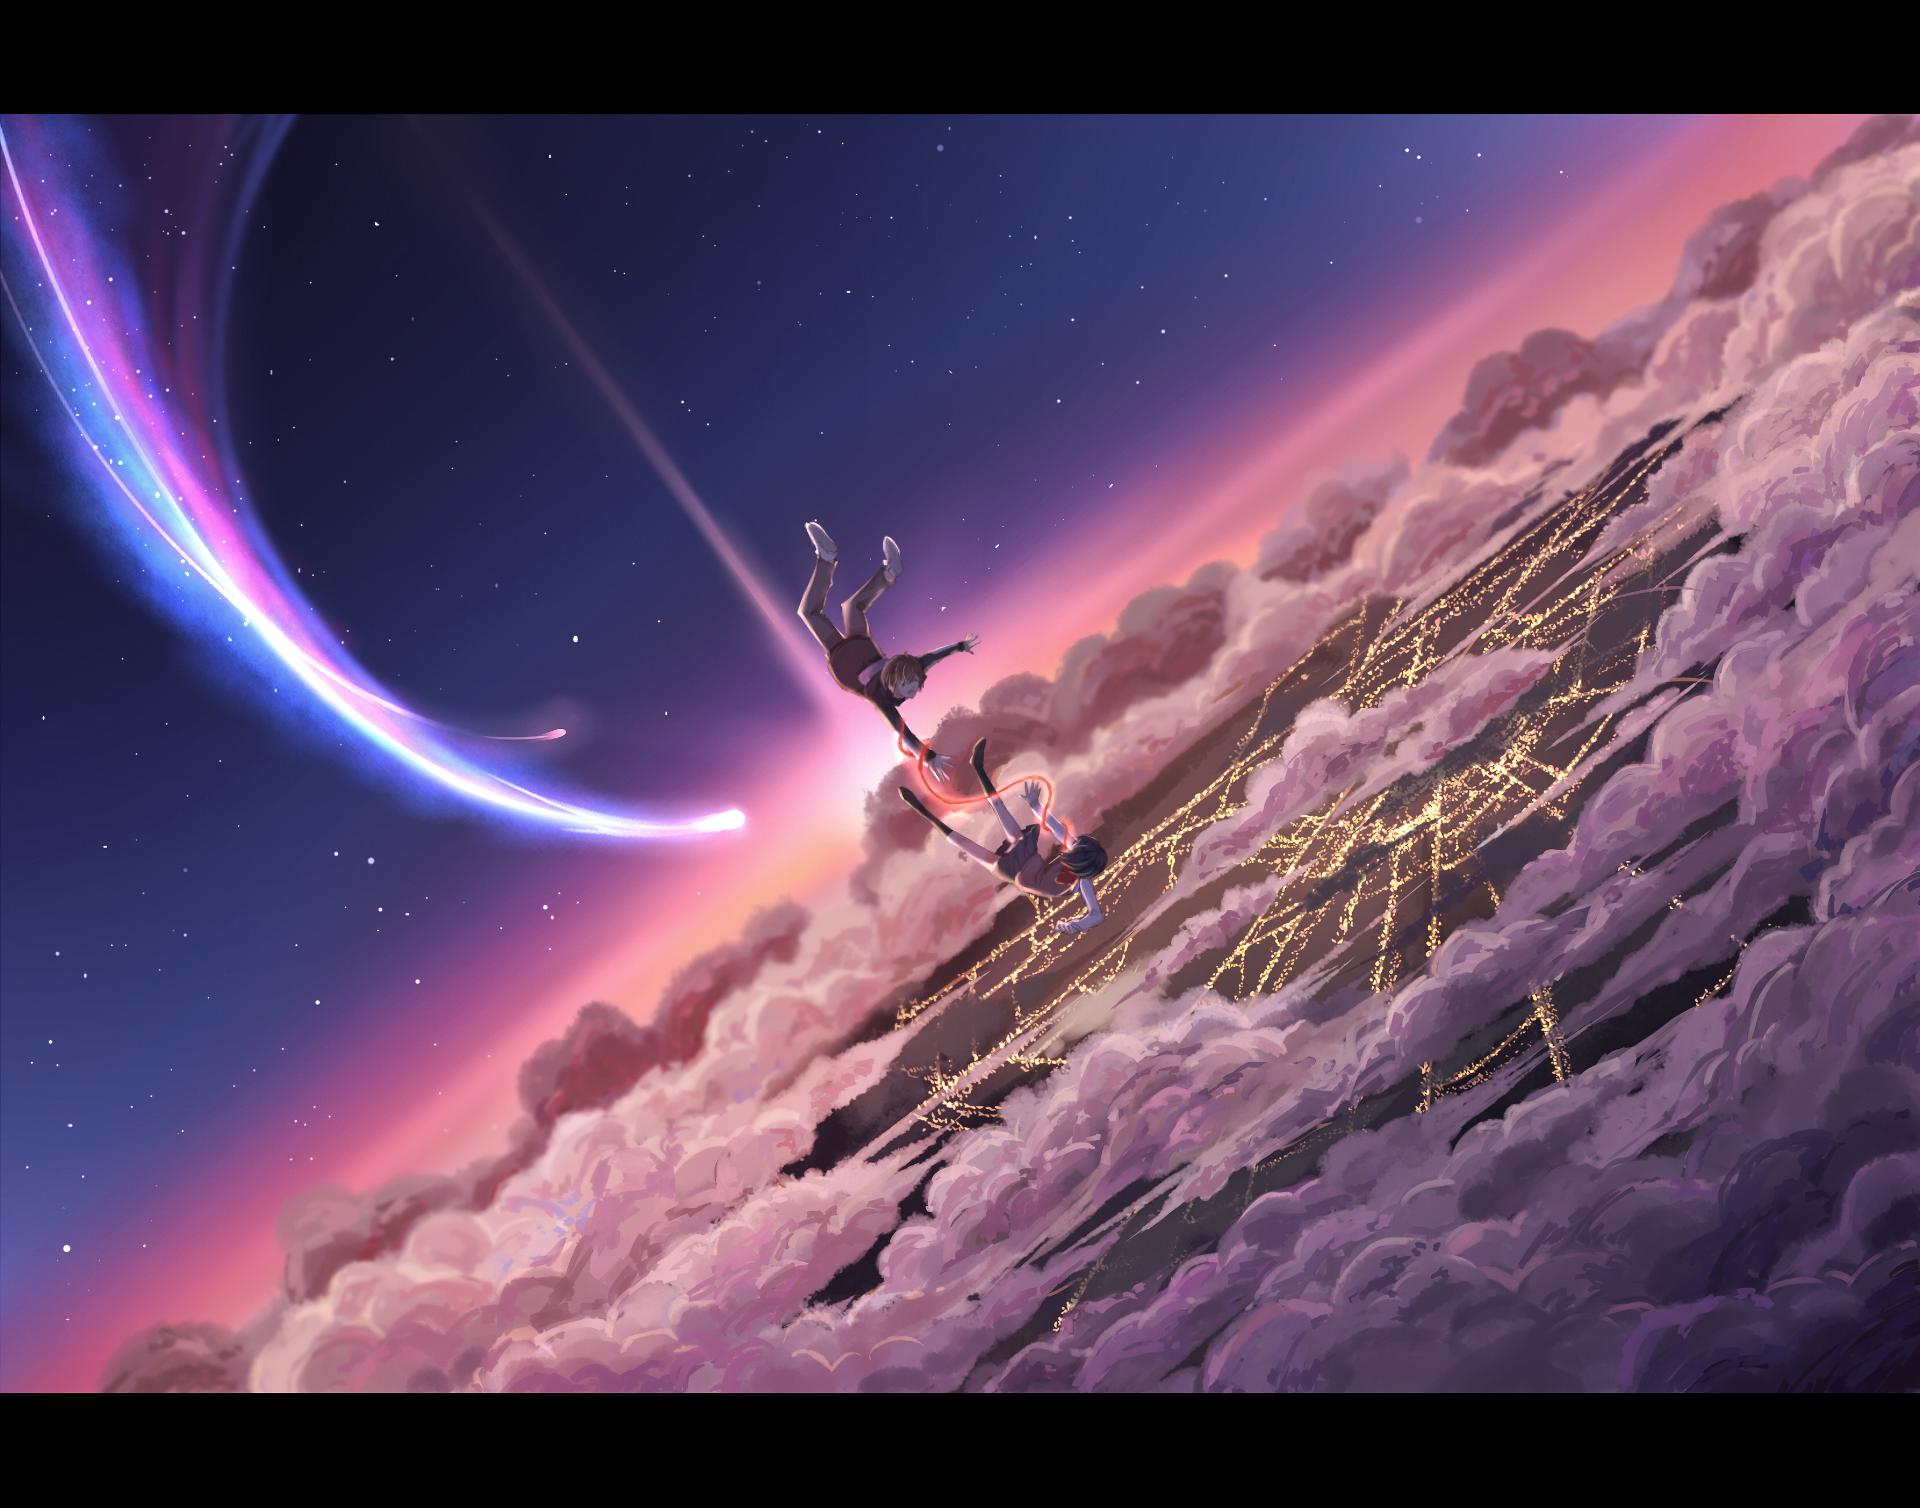 Hd wallpaper kimi no na wa - Kimi No Na Wa Mitsuha Miyamizu Hd Wallpaper Background Id 778054